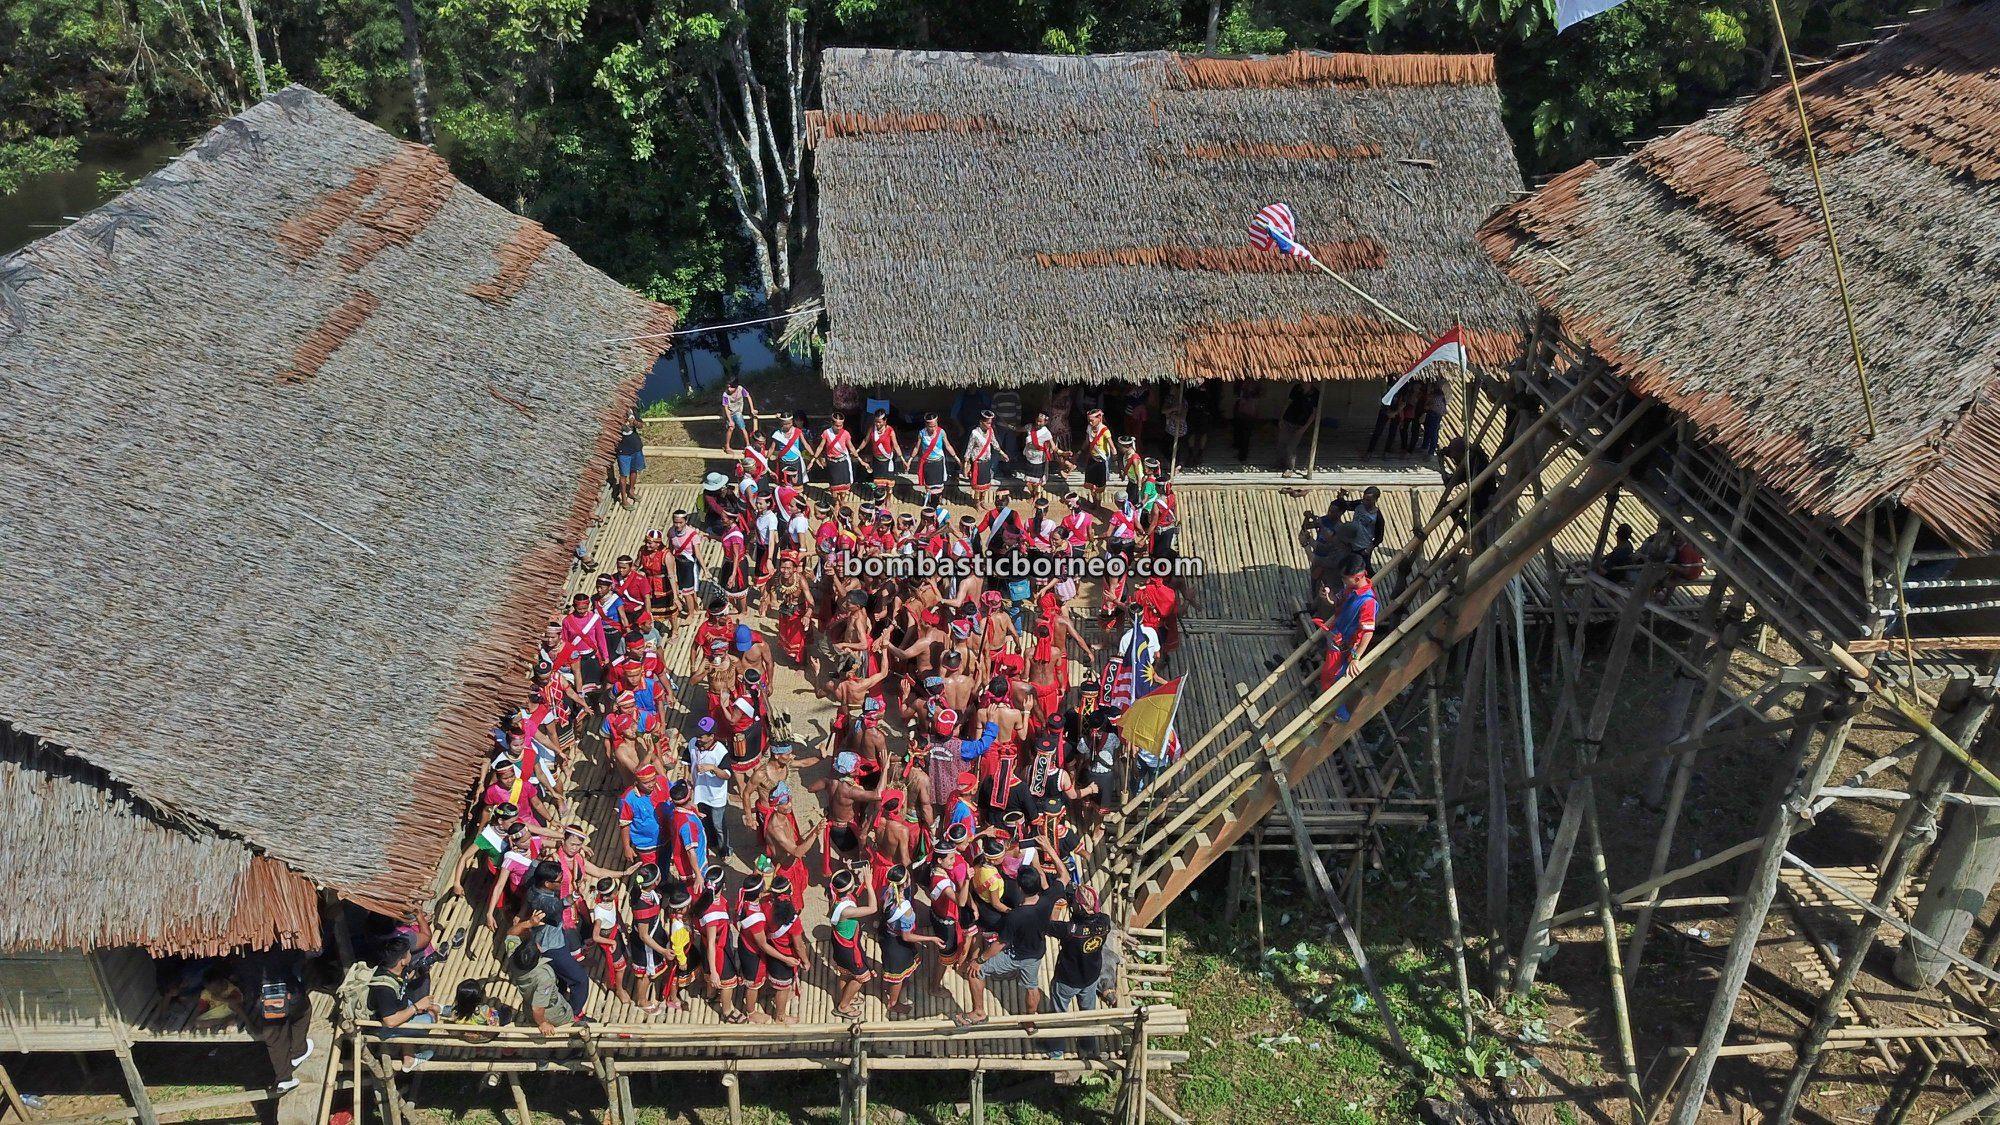 harvest festival, Sungkung Anep, authentic, traditional, culture, Indonesia, Dayak Bidayuh, native, highland, village, travel guide, Trans Border, Borneo, 跨境婆罗洲游踪, 西加里曼丹传统文化, 原住民丰收节日